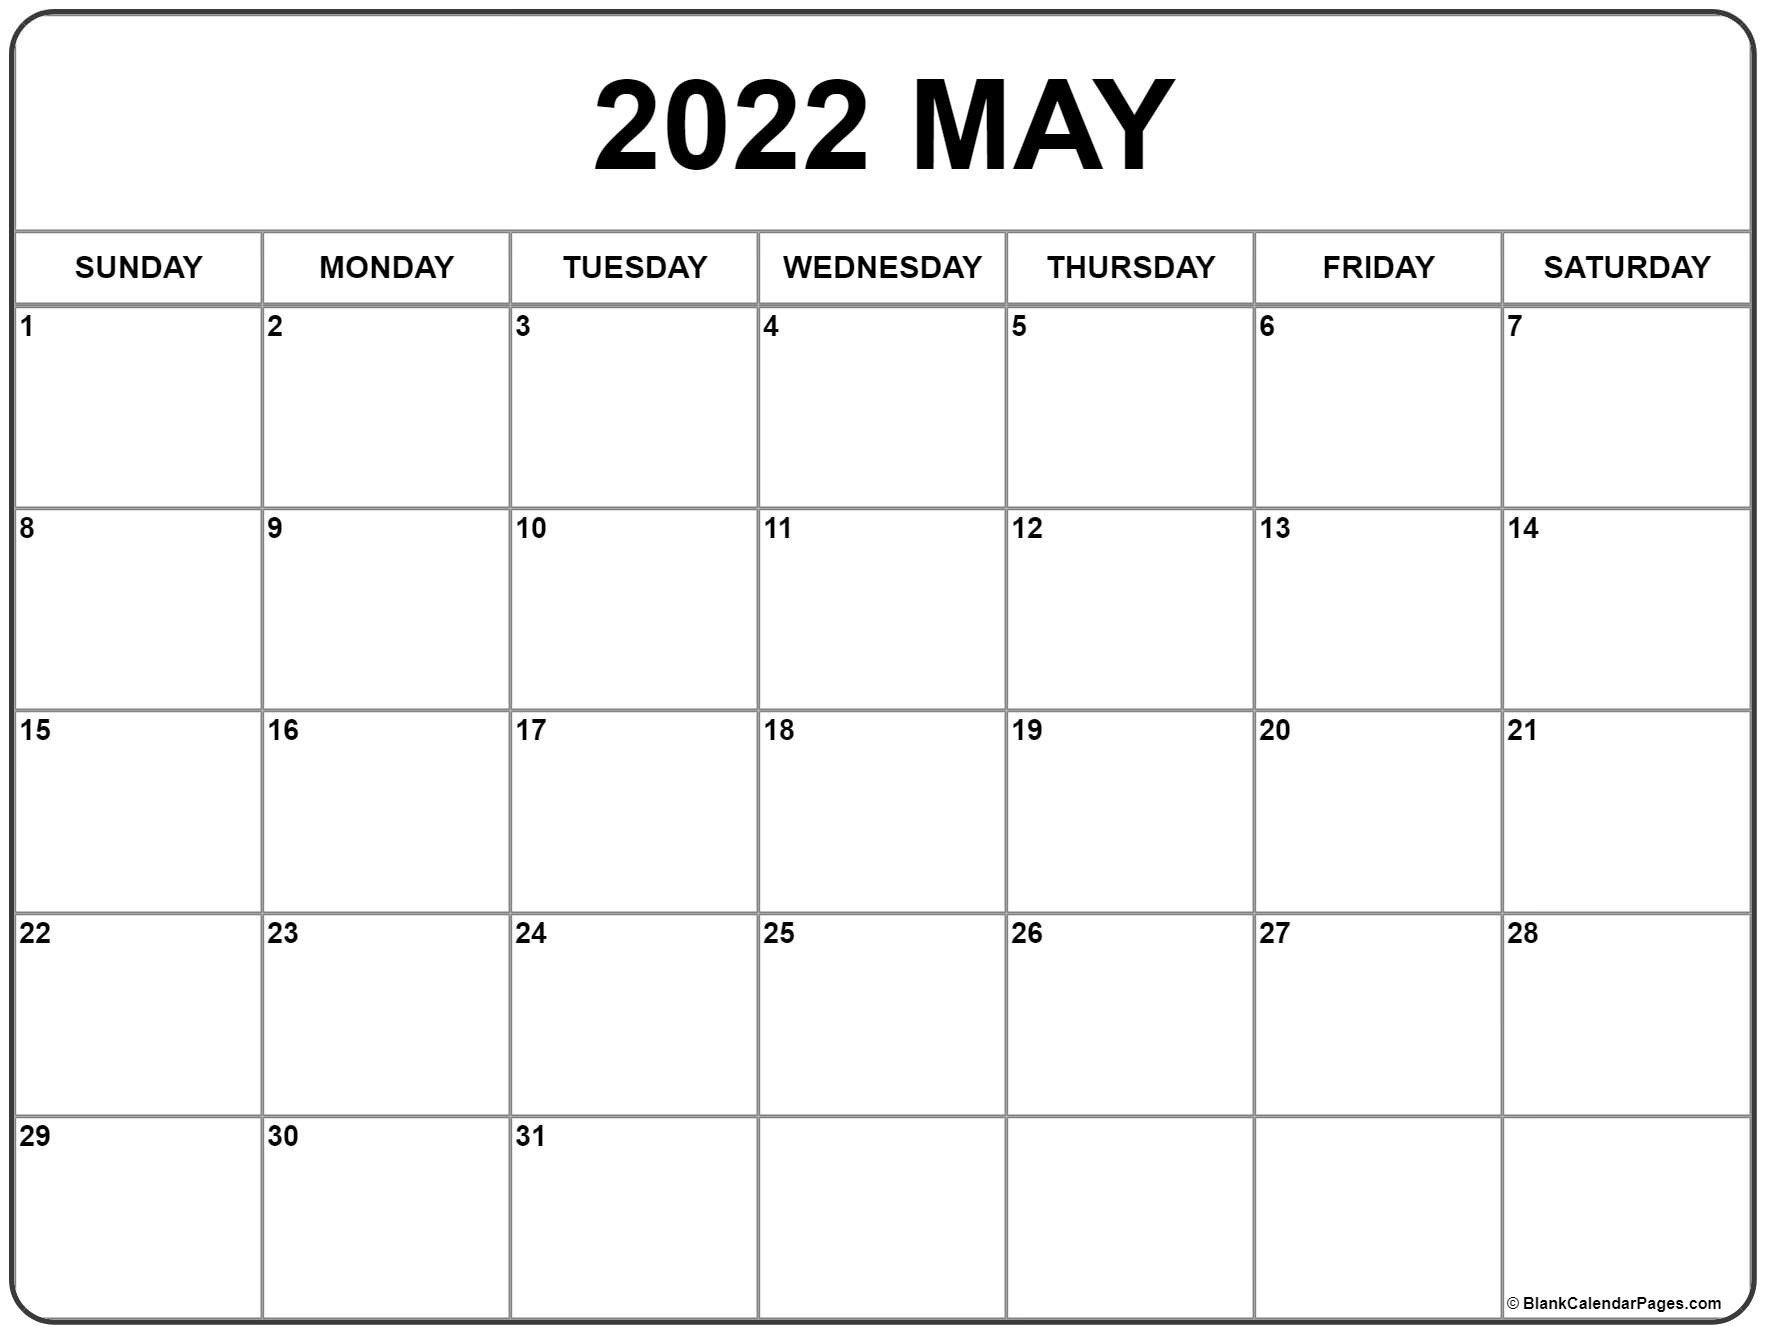 May 2022 Calendar Printable | Free Printable Calendar Monthly inside May 2022 Calendar Printable Photo